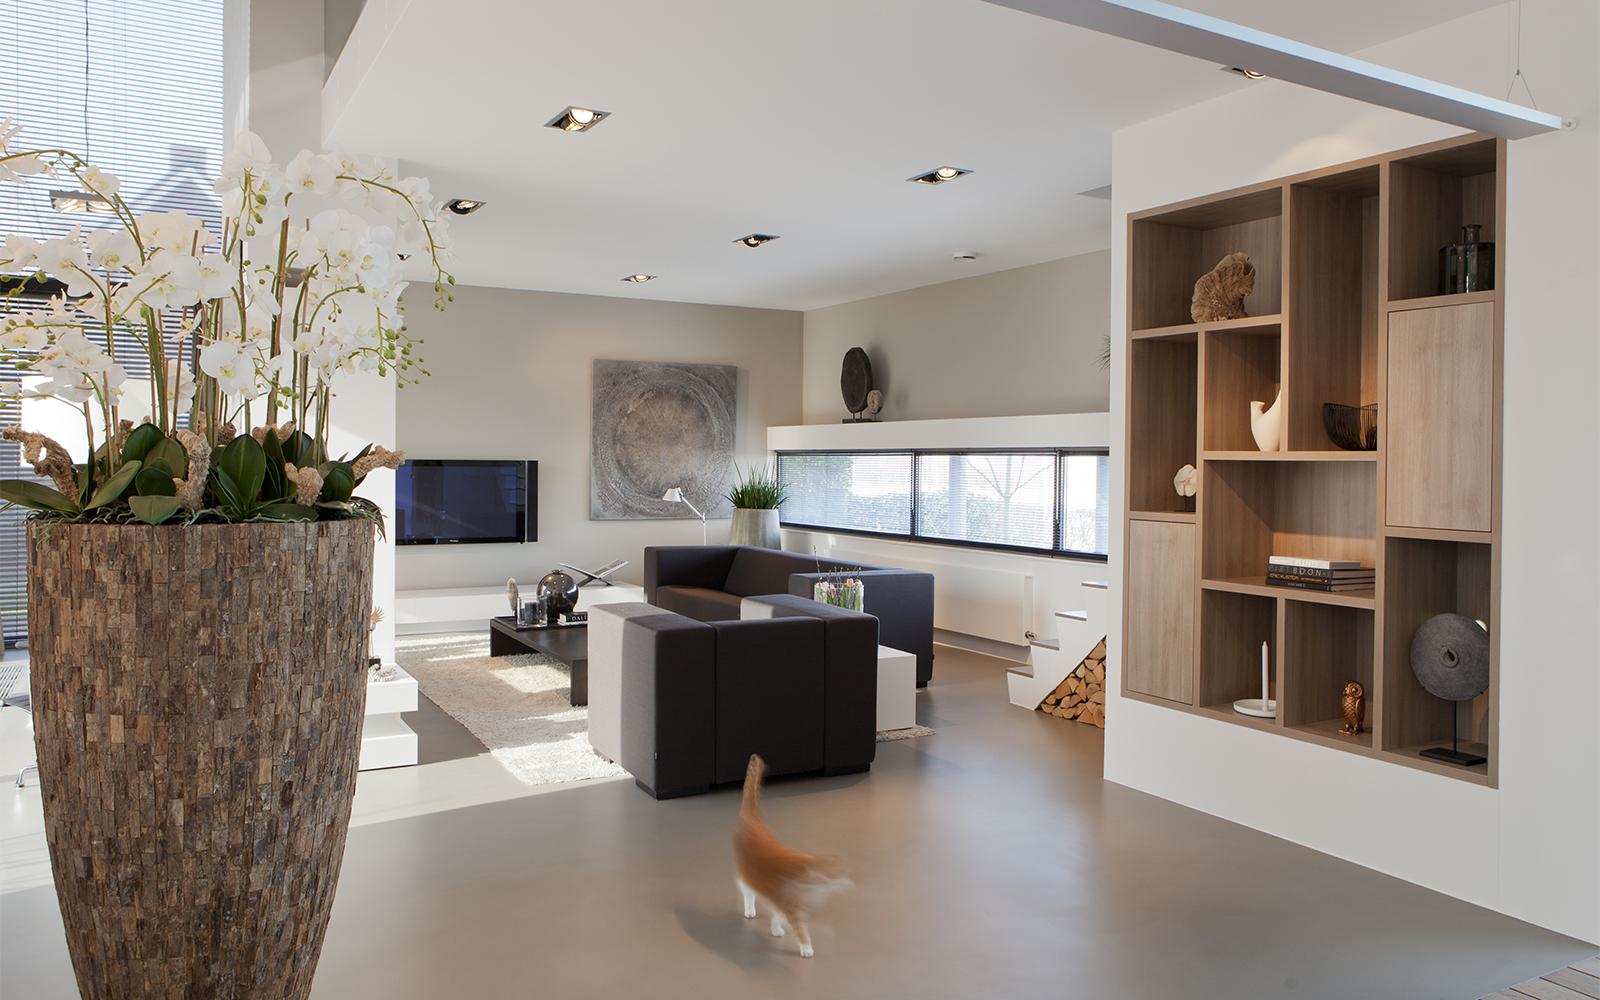 Warm interieur, C'avante, glaspartijen, kunst, open villa, lichtrijk, houtdetails